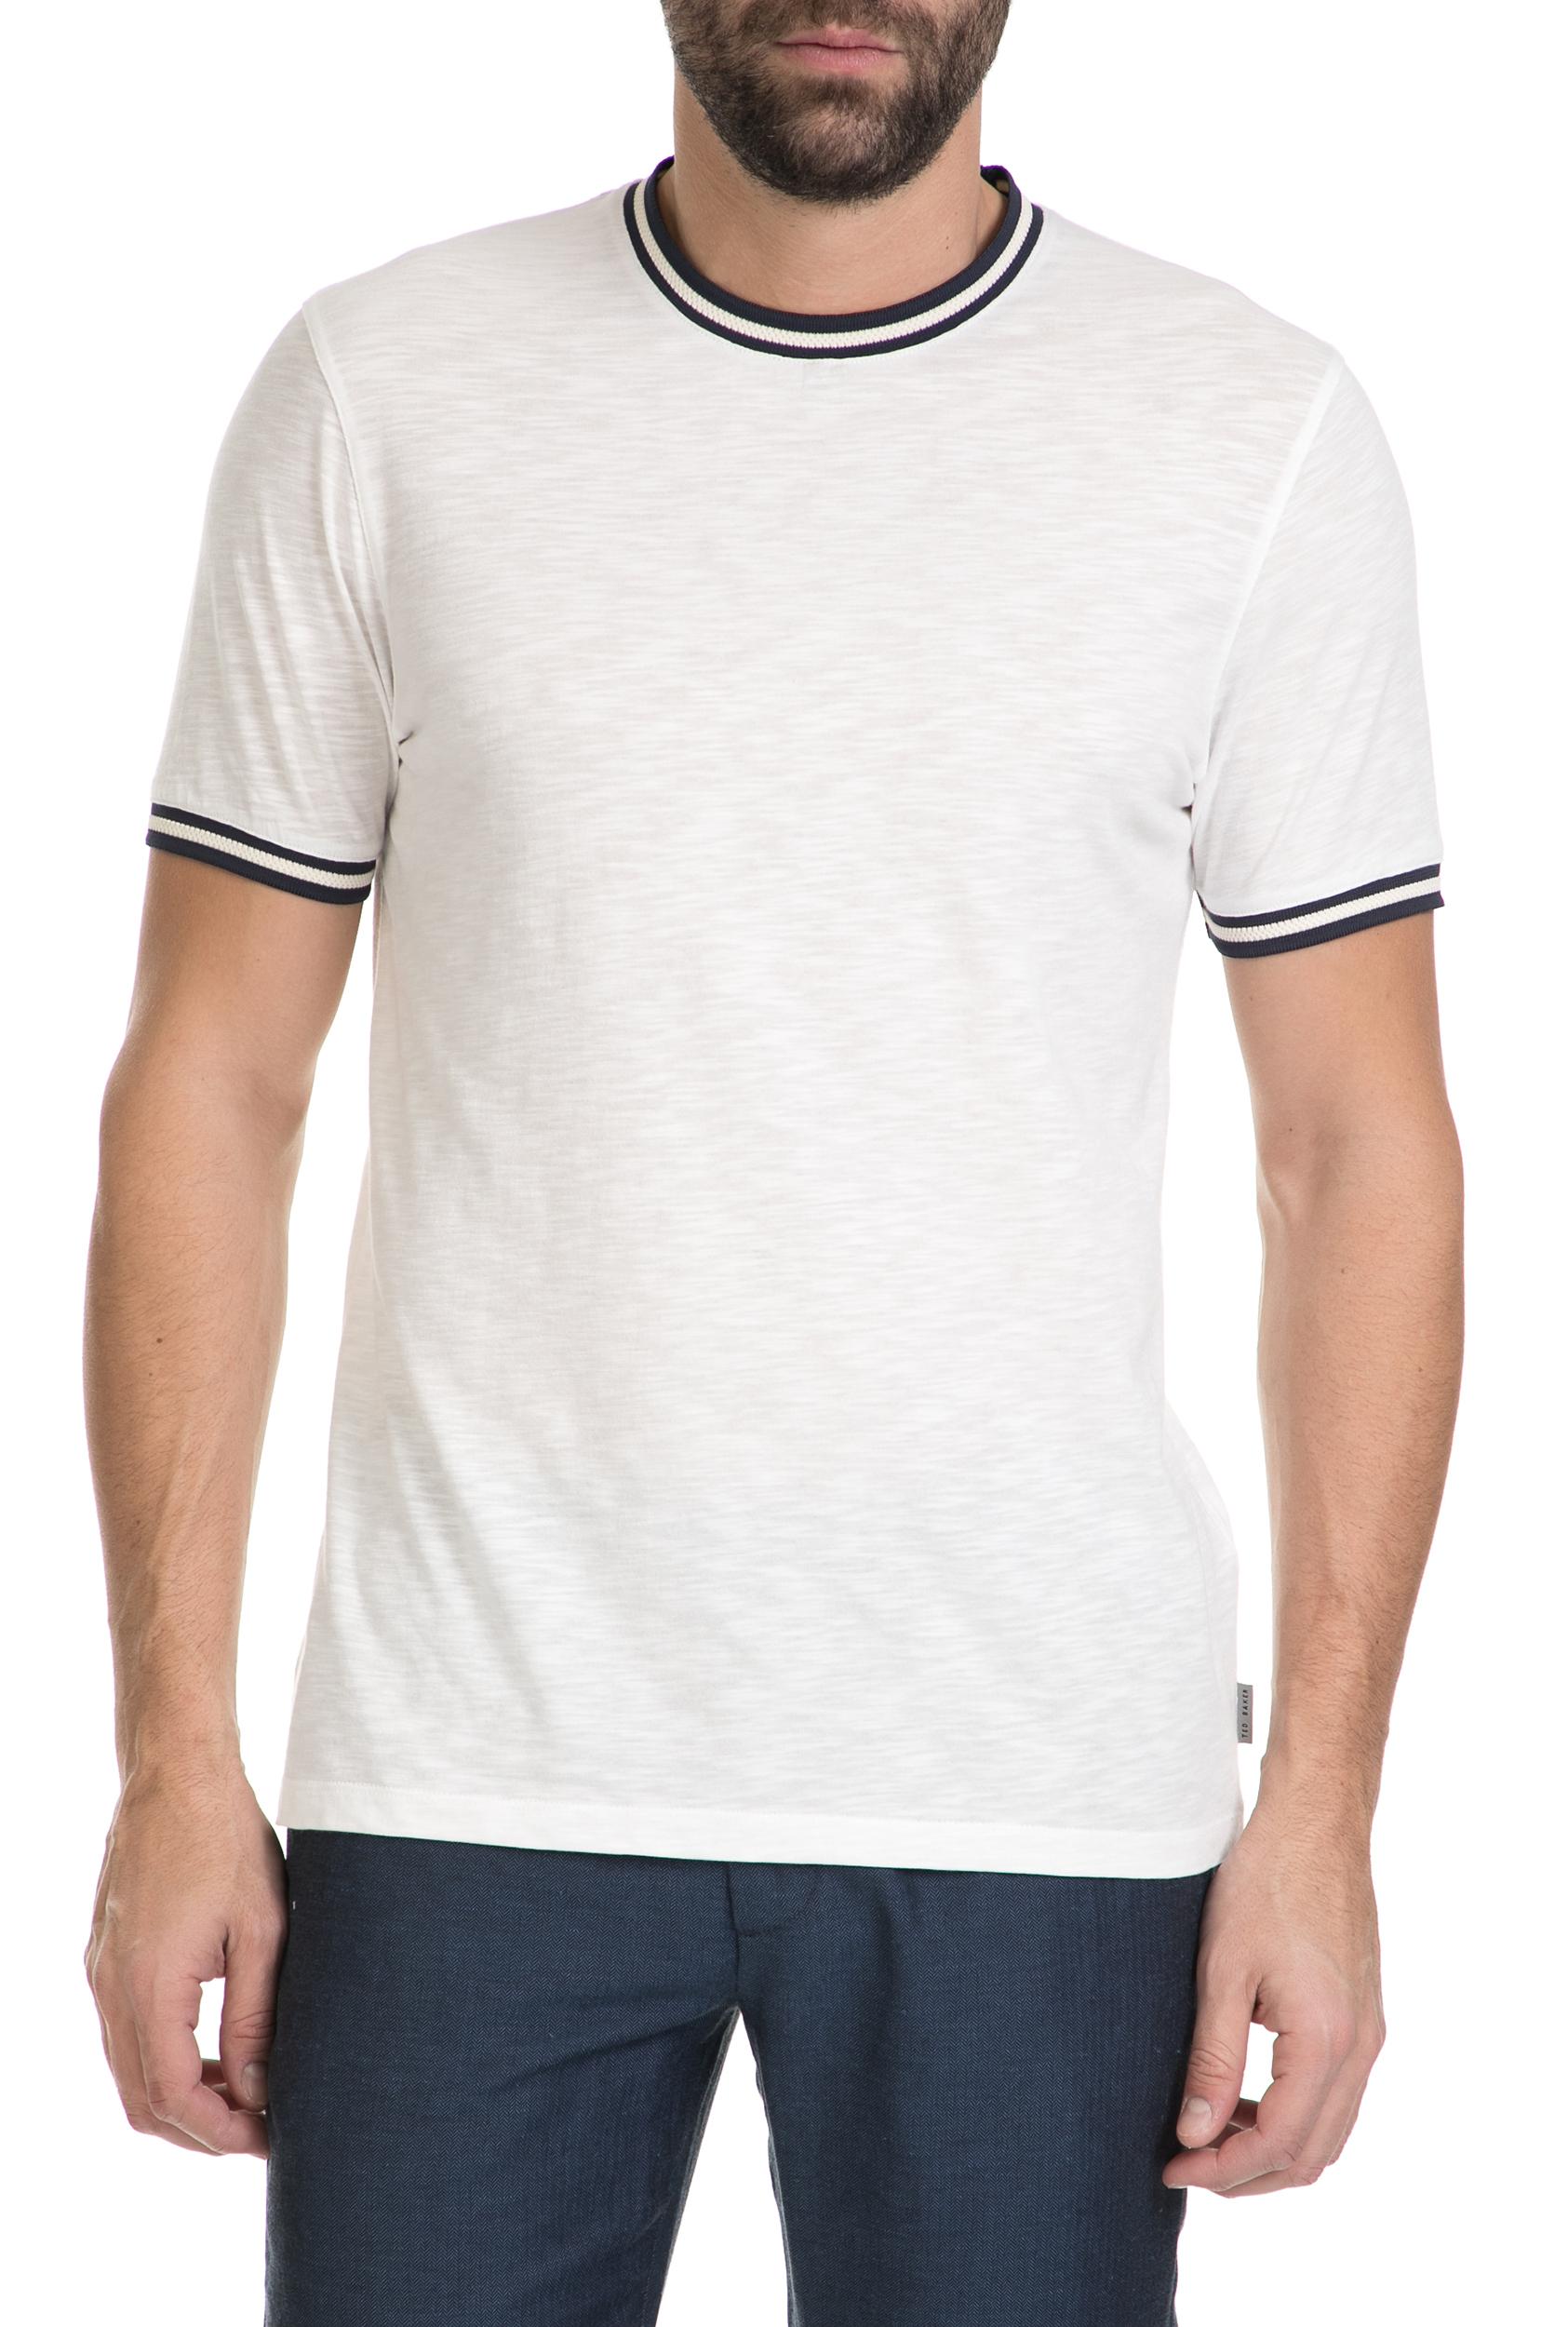 8fb5c3d7aed5 TED BAKER - Ανδρικό κοντομάνικο μπλουζάκι TED BAKER λευκό